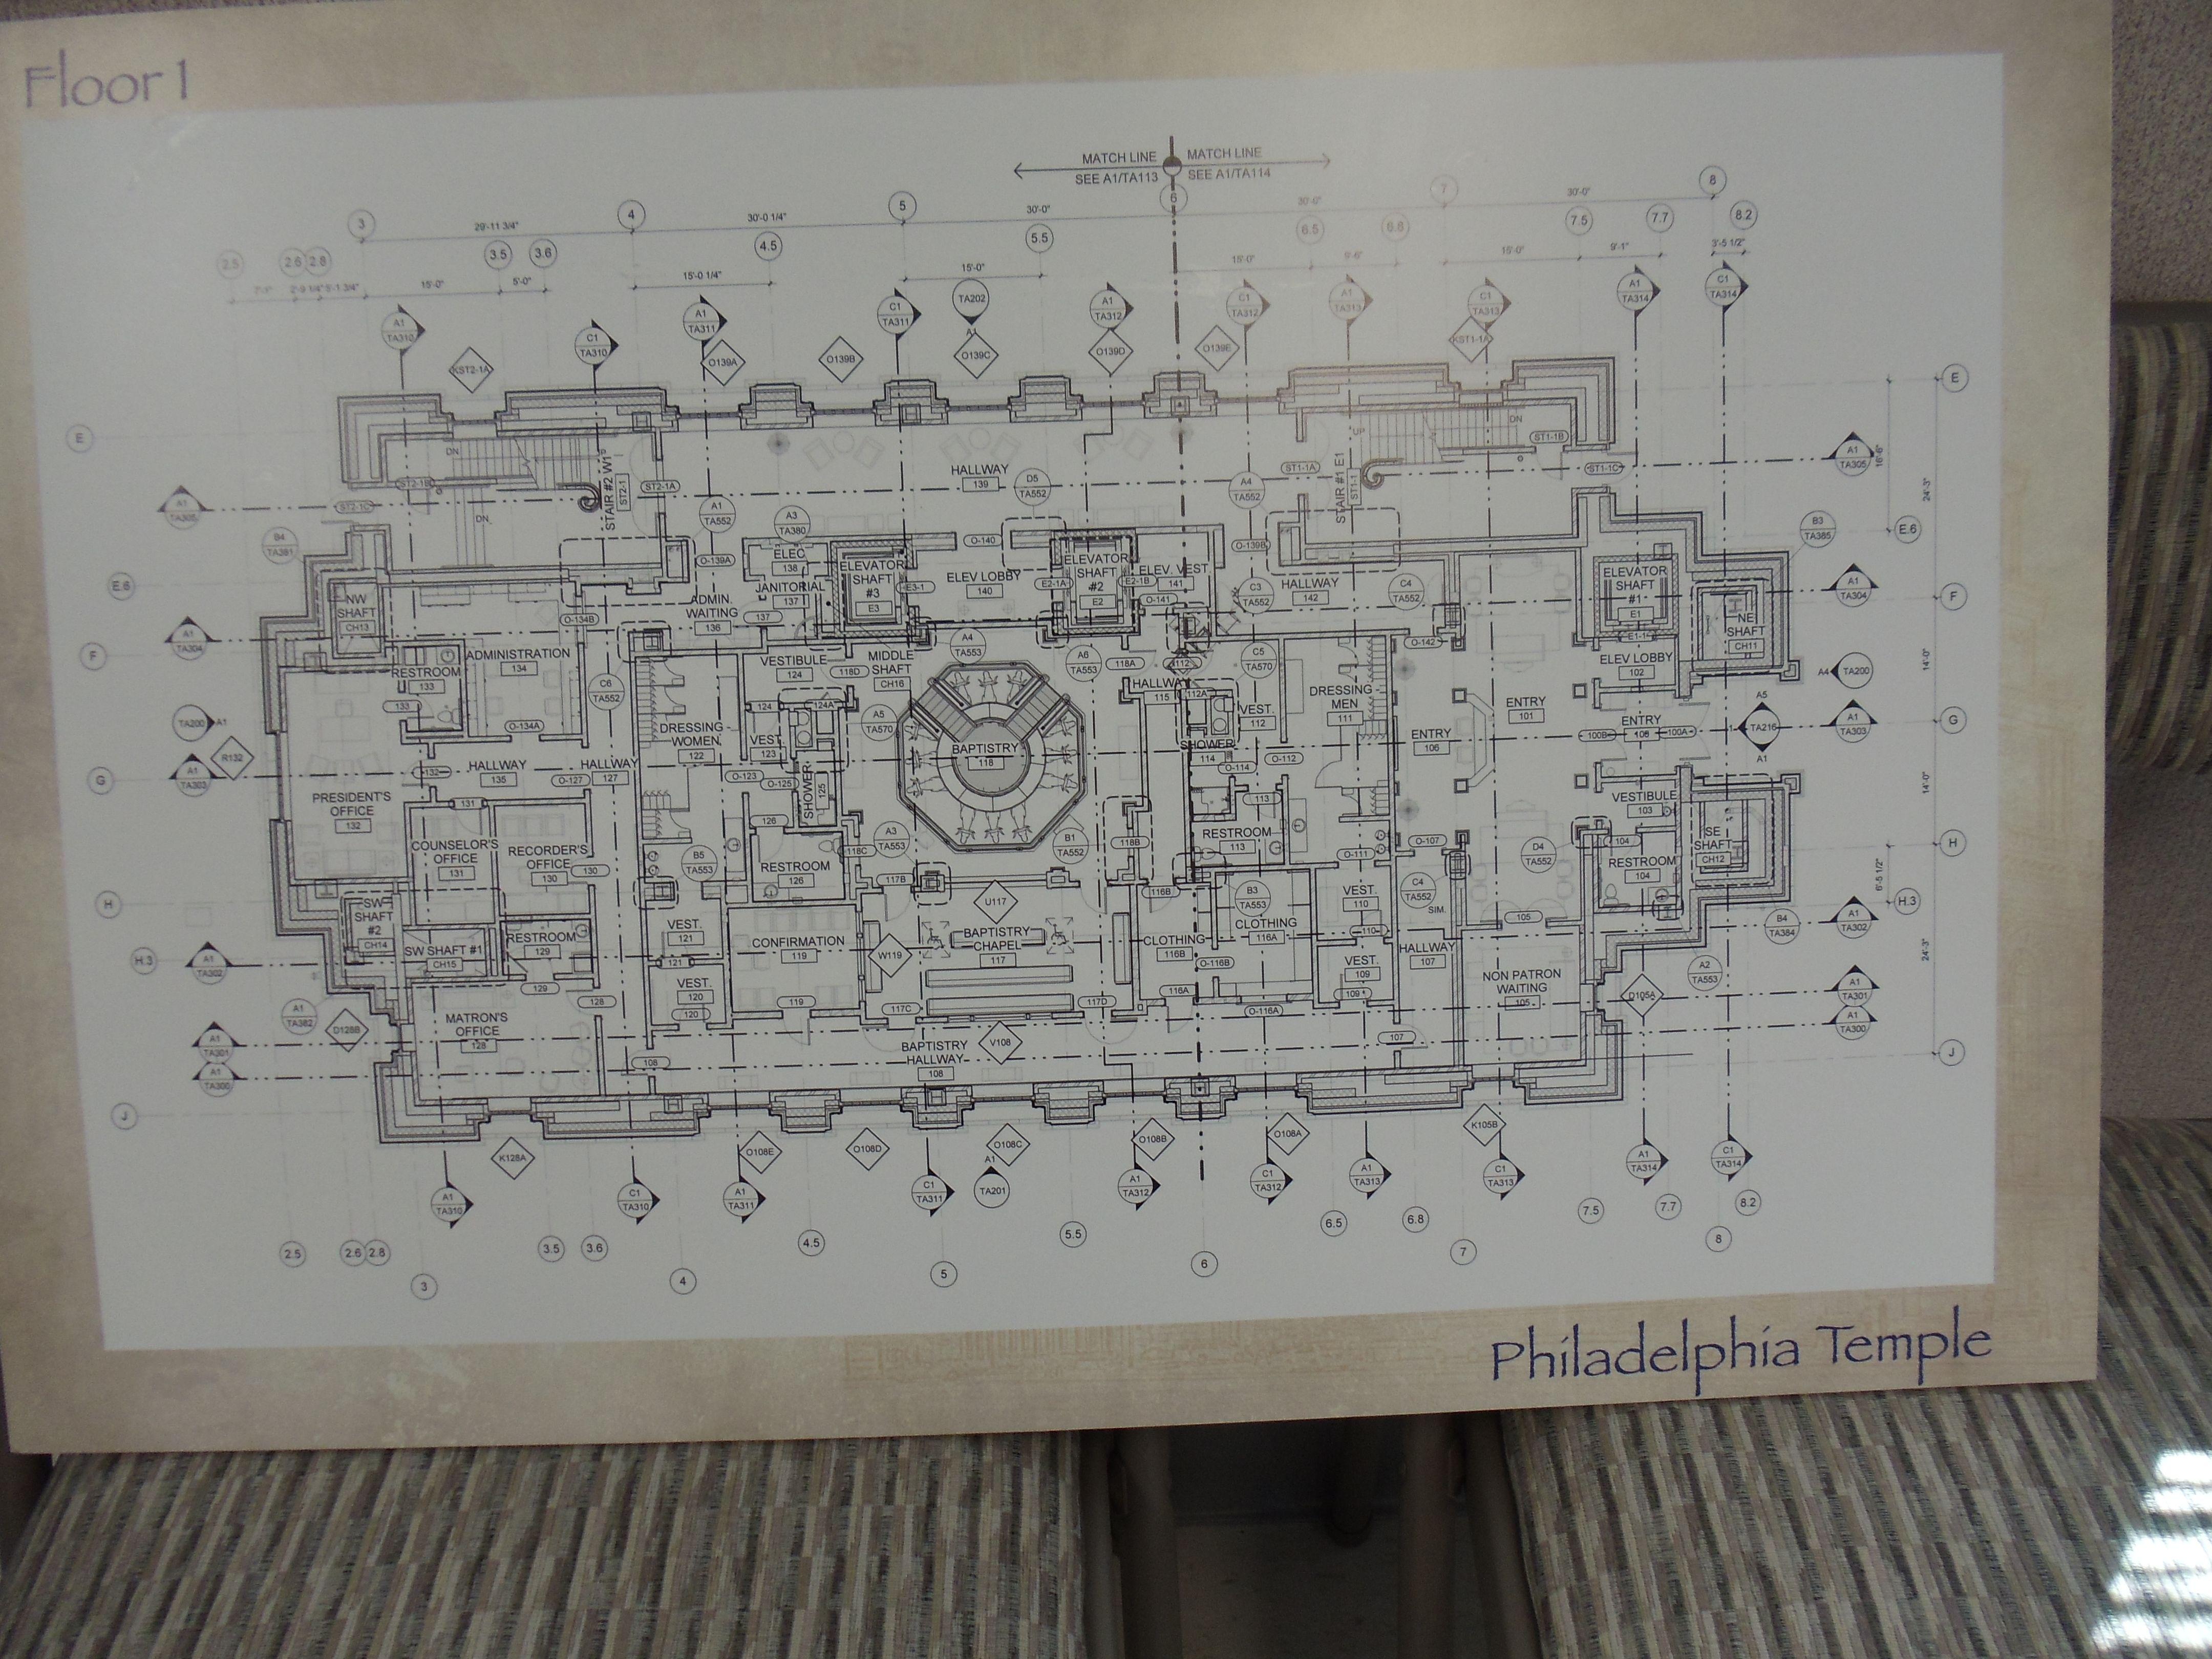 philadelphia pennsylvania lds mormon temple first floor plan philadelphia pennsylvania lds mormon temple first floor plan